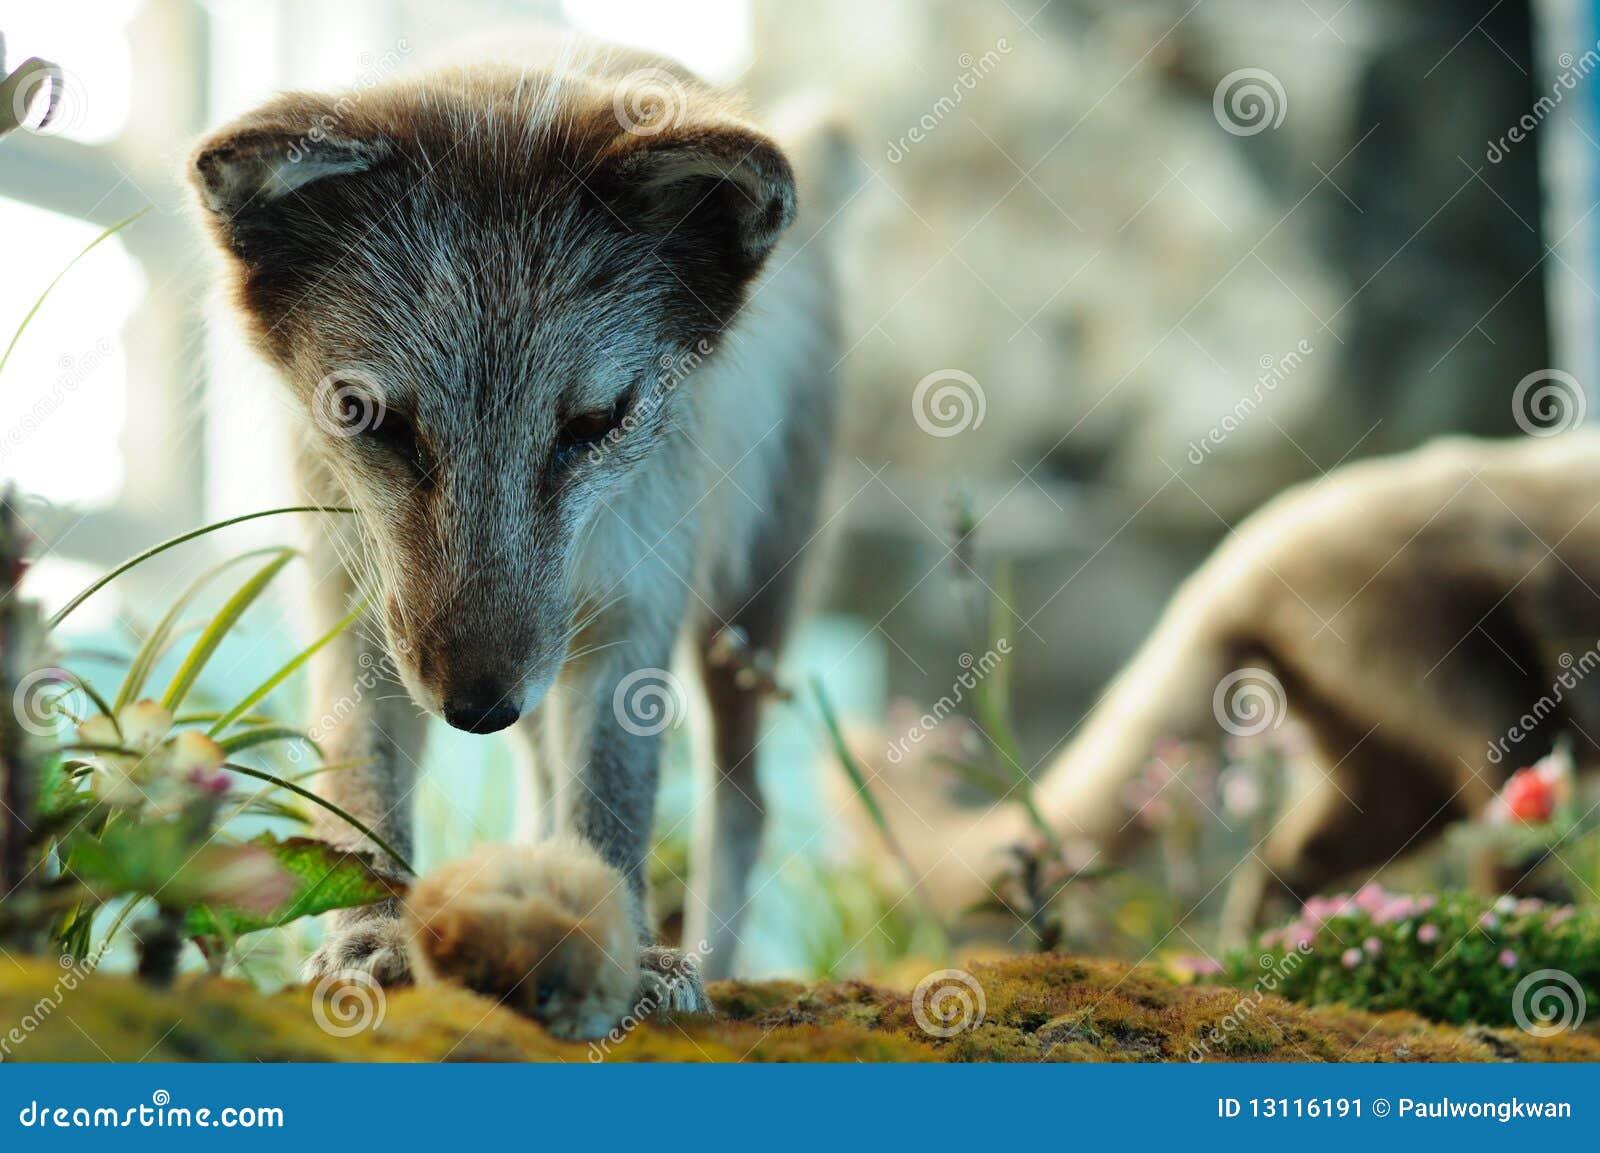 Arctic fox hunting